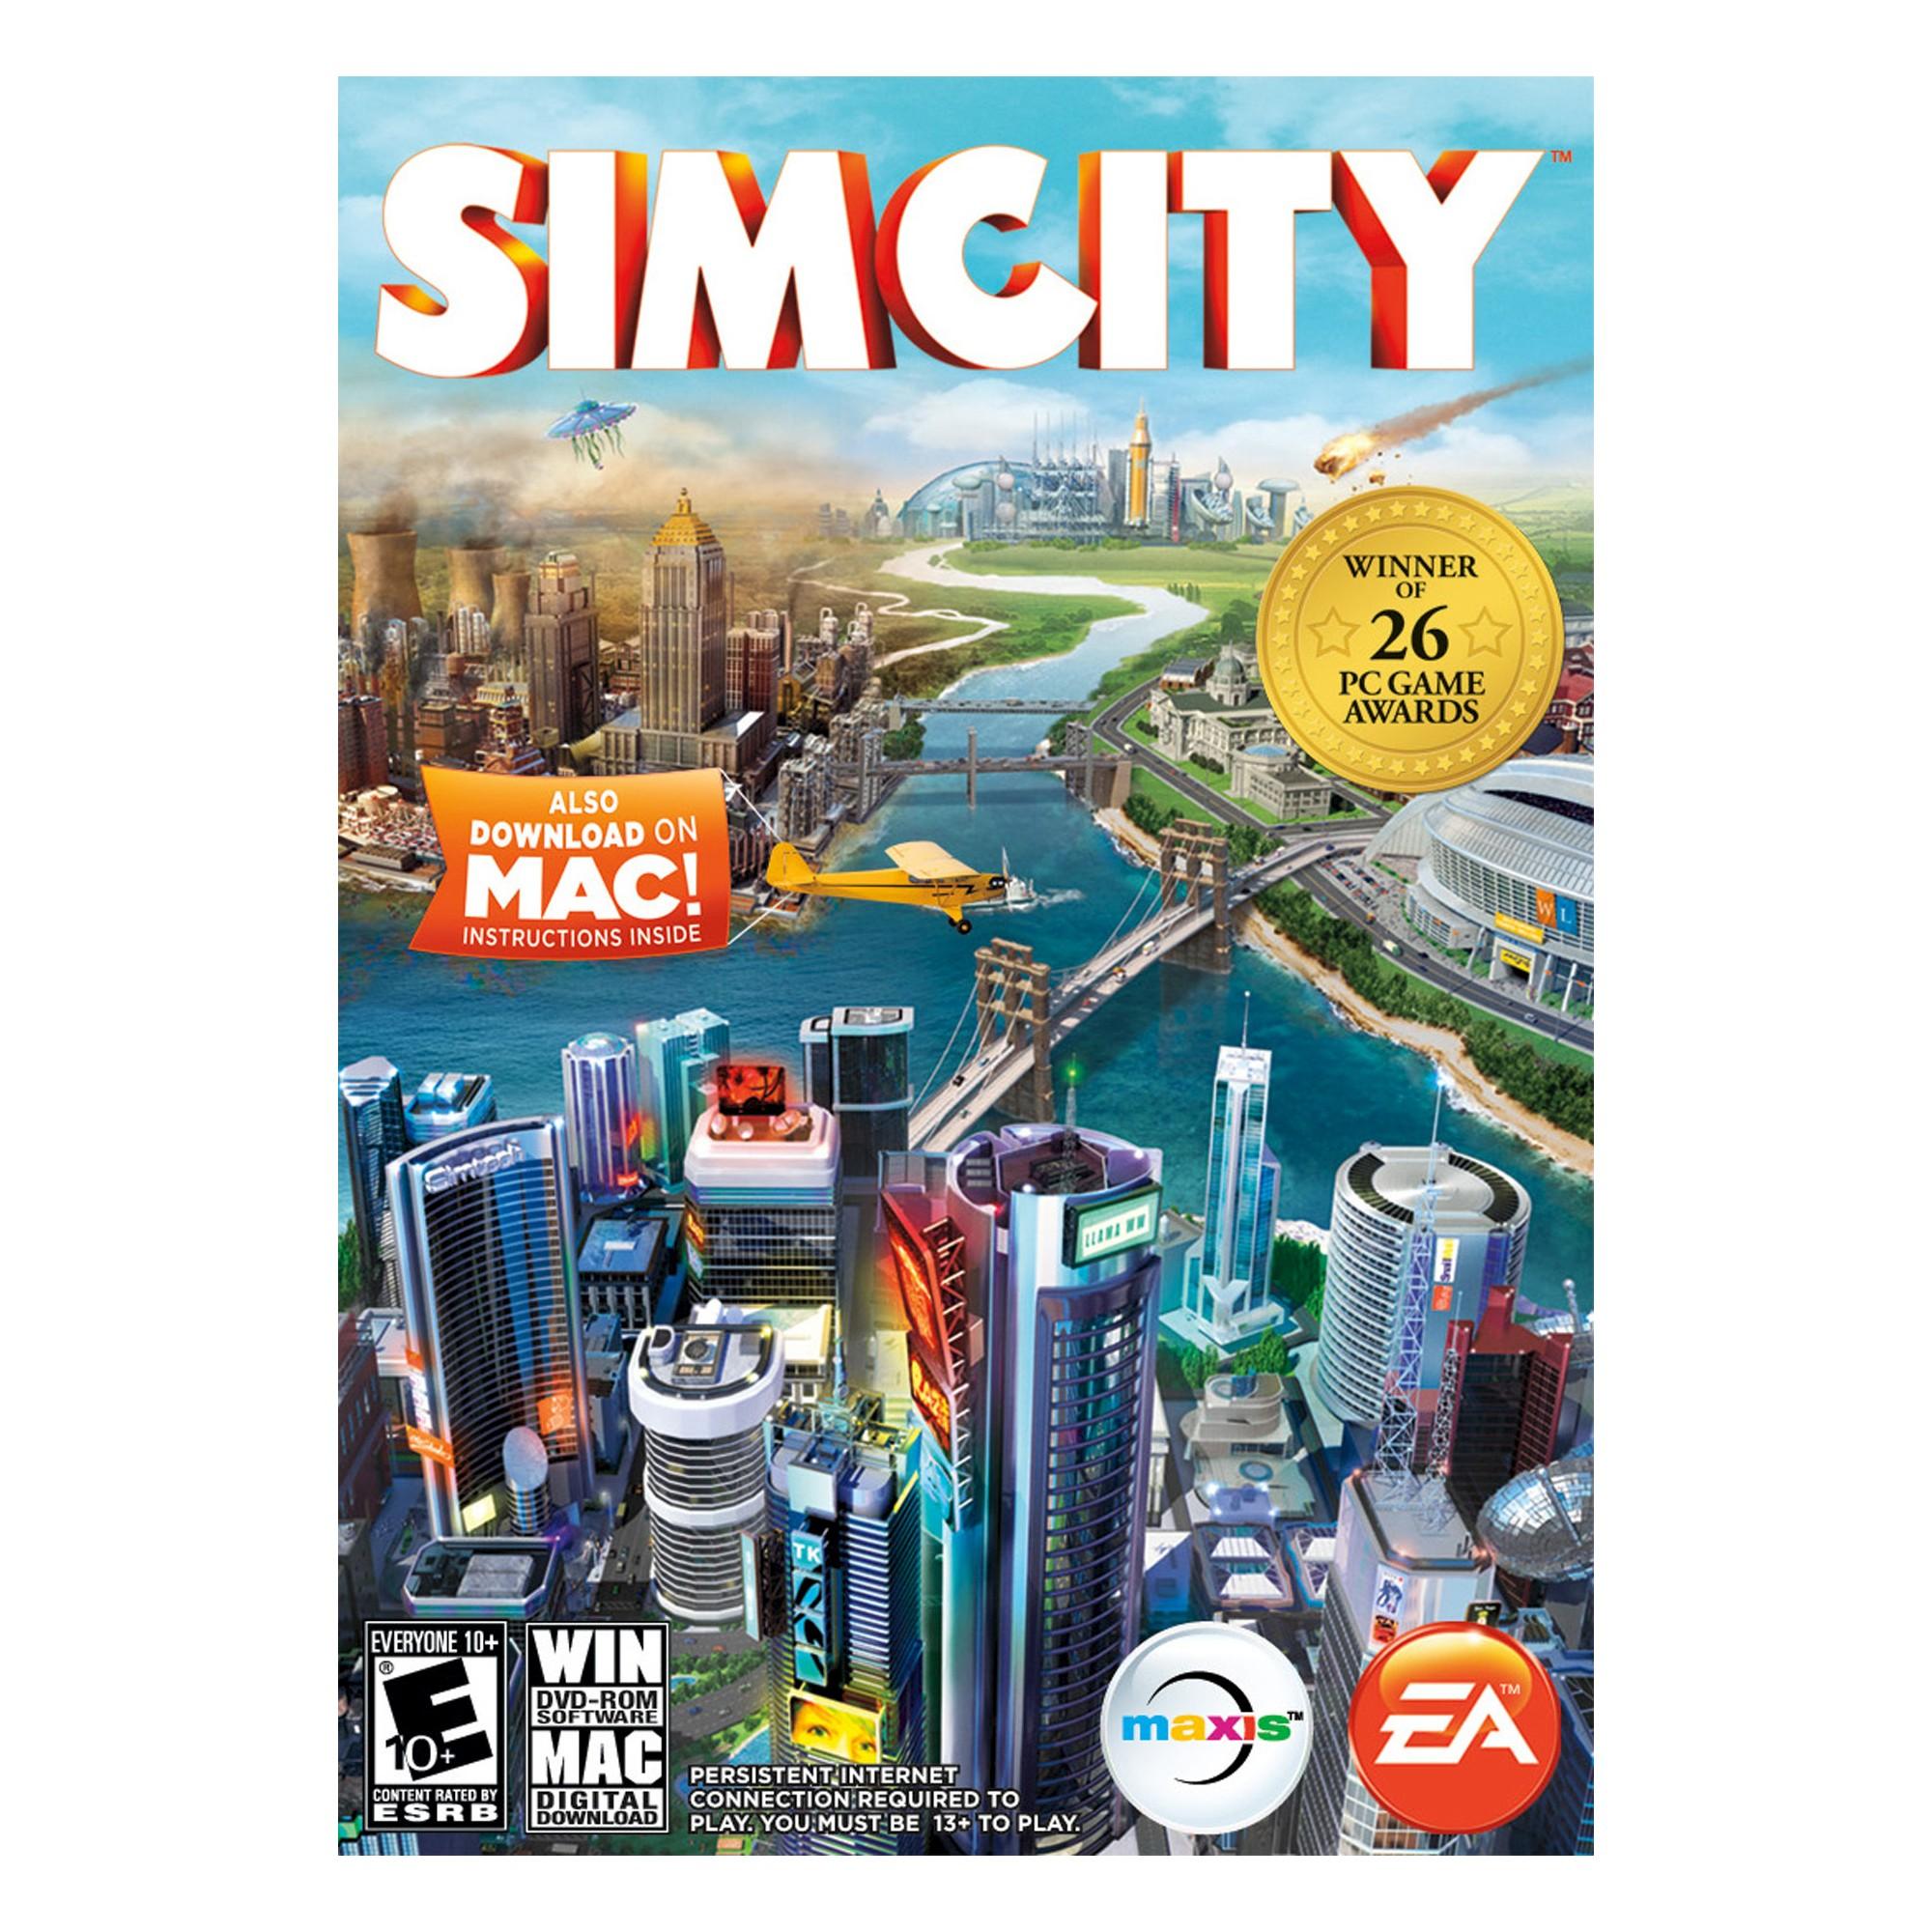 SimCity Electronic Software Download PC/Mac Games, Mac